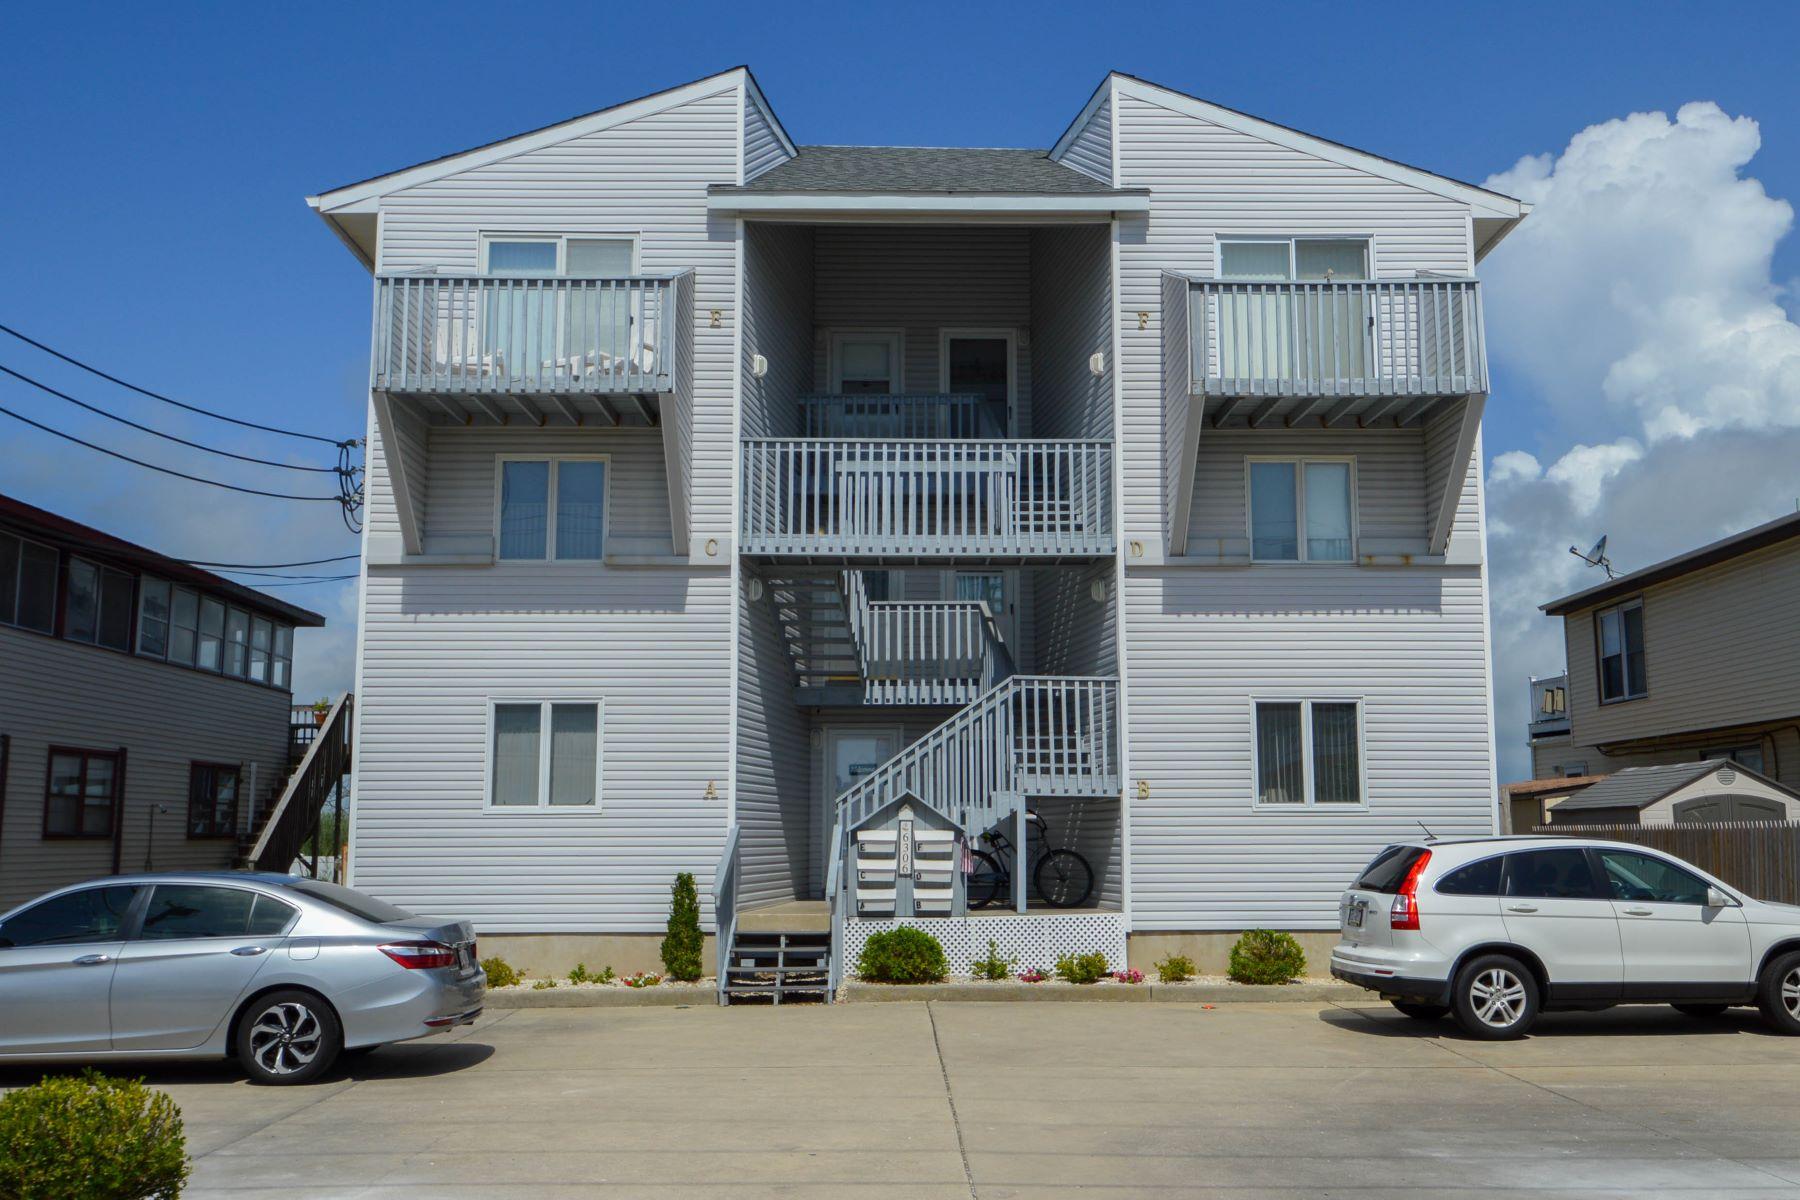 Condominium for Sale at Bay View Condo 6306 Central Ave Unit B, Sea Isle City, New Jersey 08243 United States